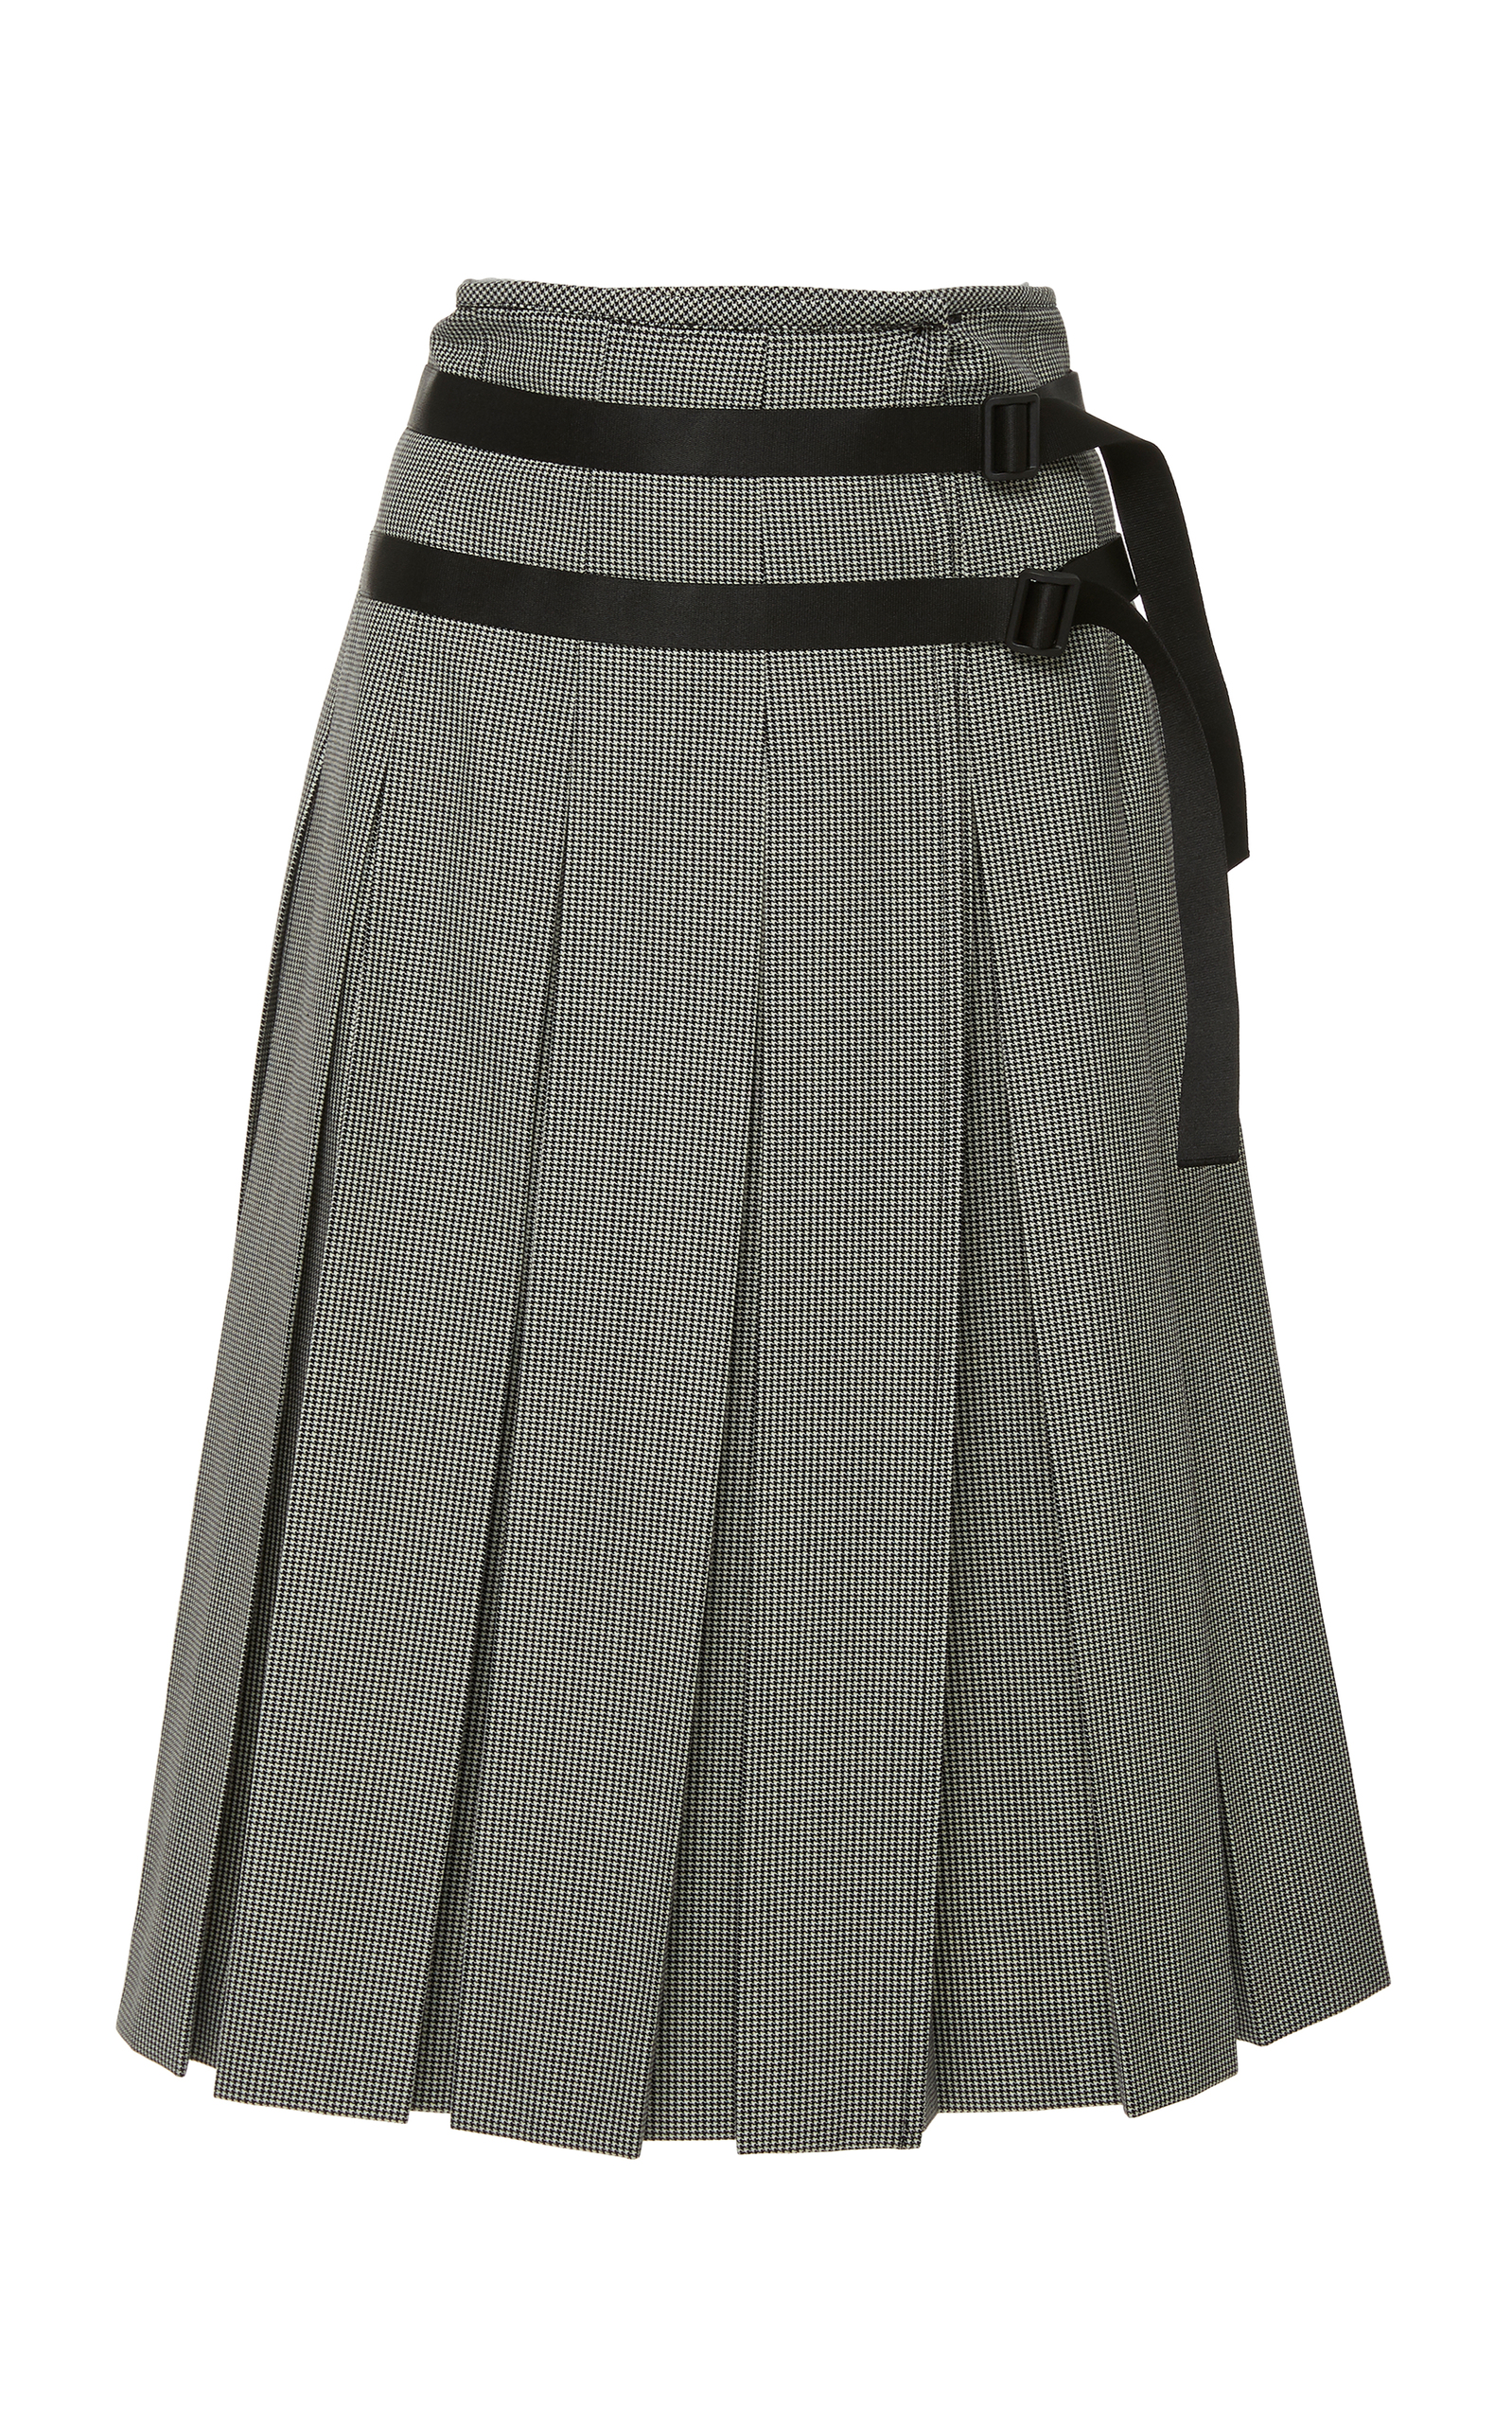 93fba741c957c5 Pepita Wool Pleated Skirt by Tomas Maier | Moda Operandi